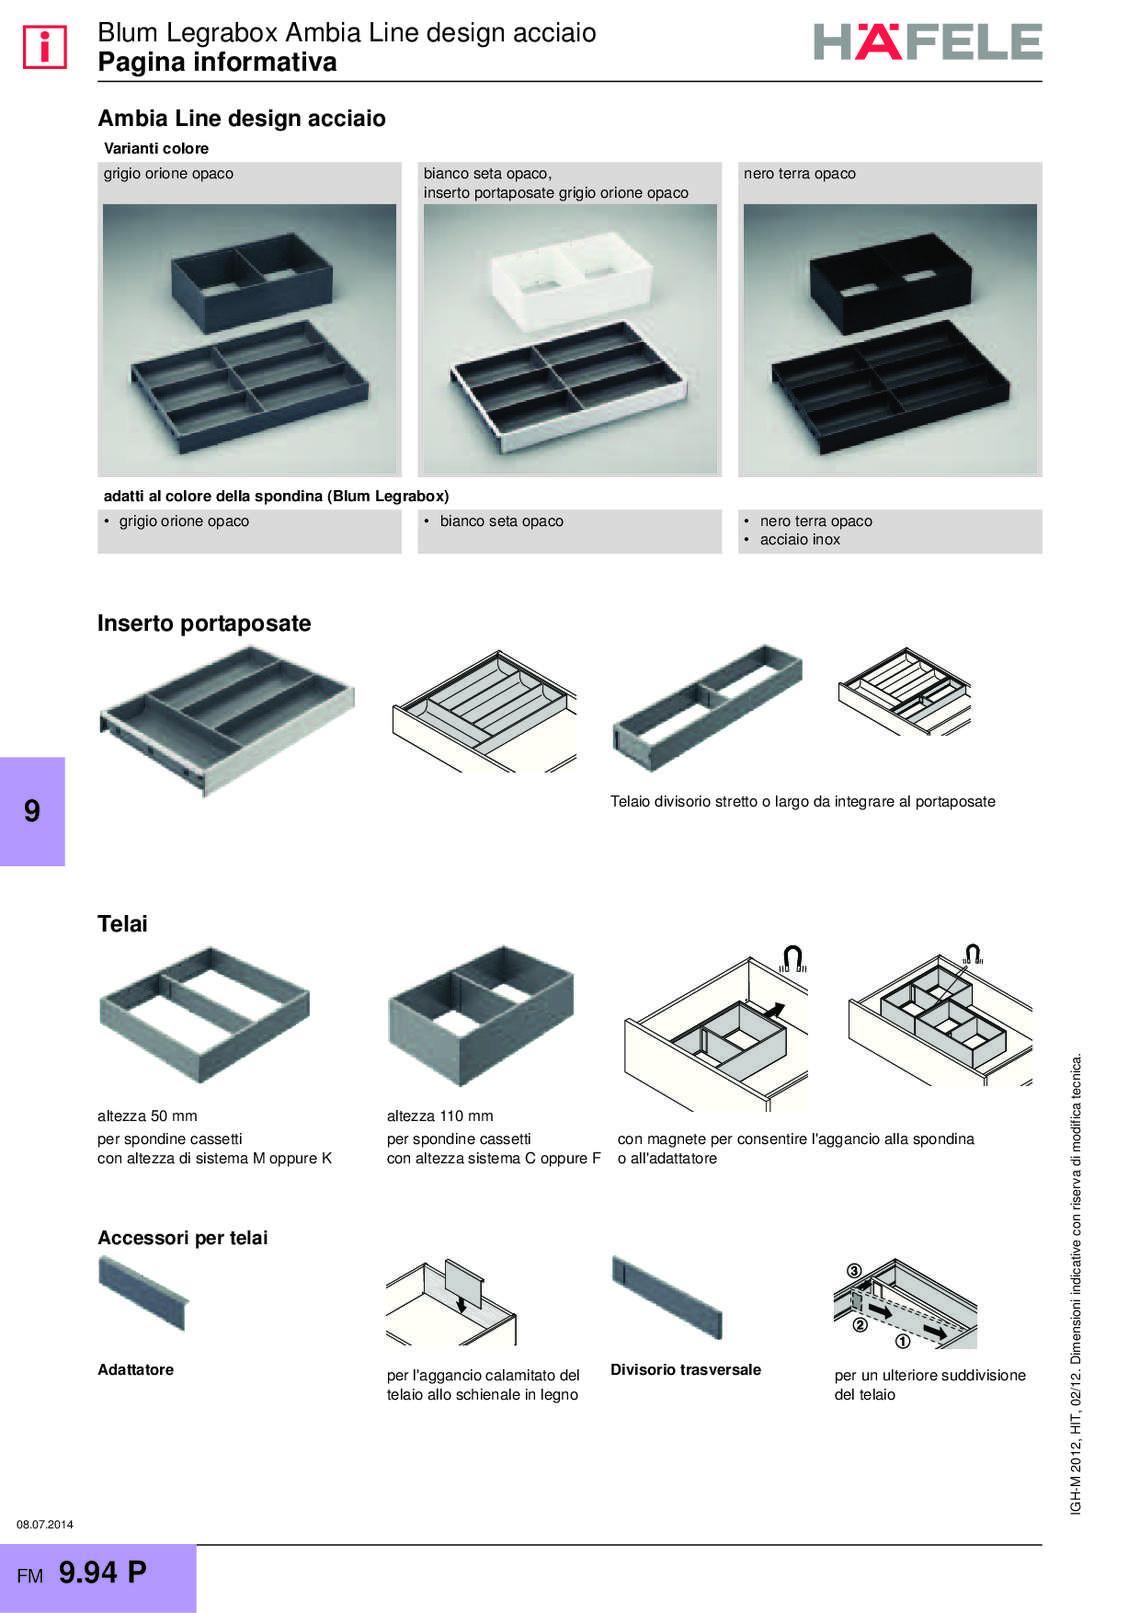 hafele-spondine-e-guide-per-mobili_40_133.jpg